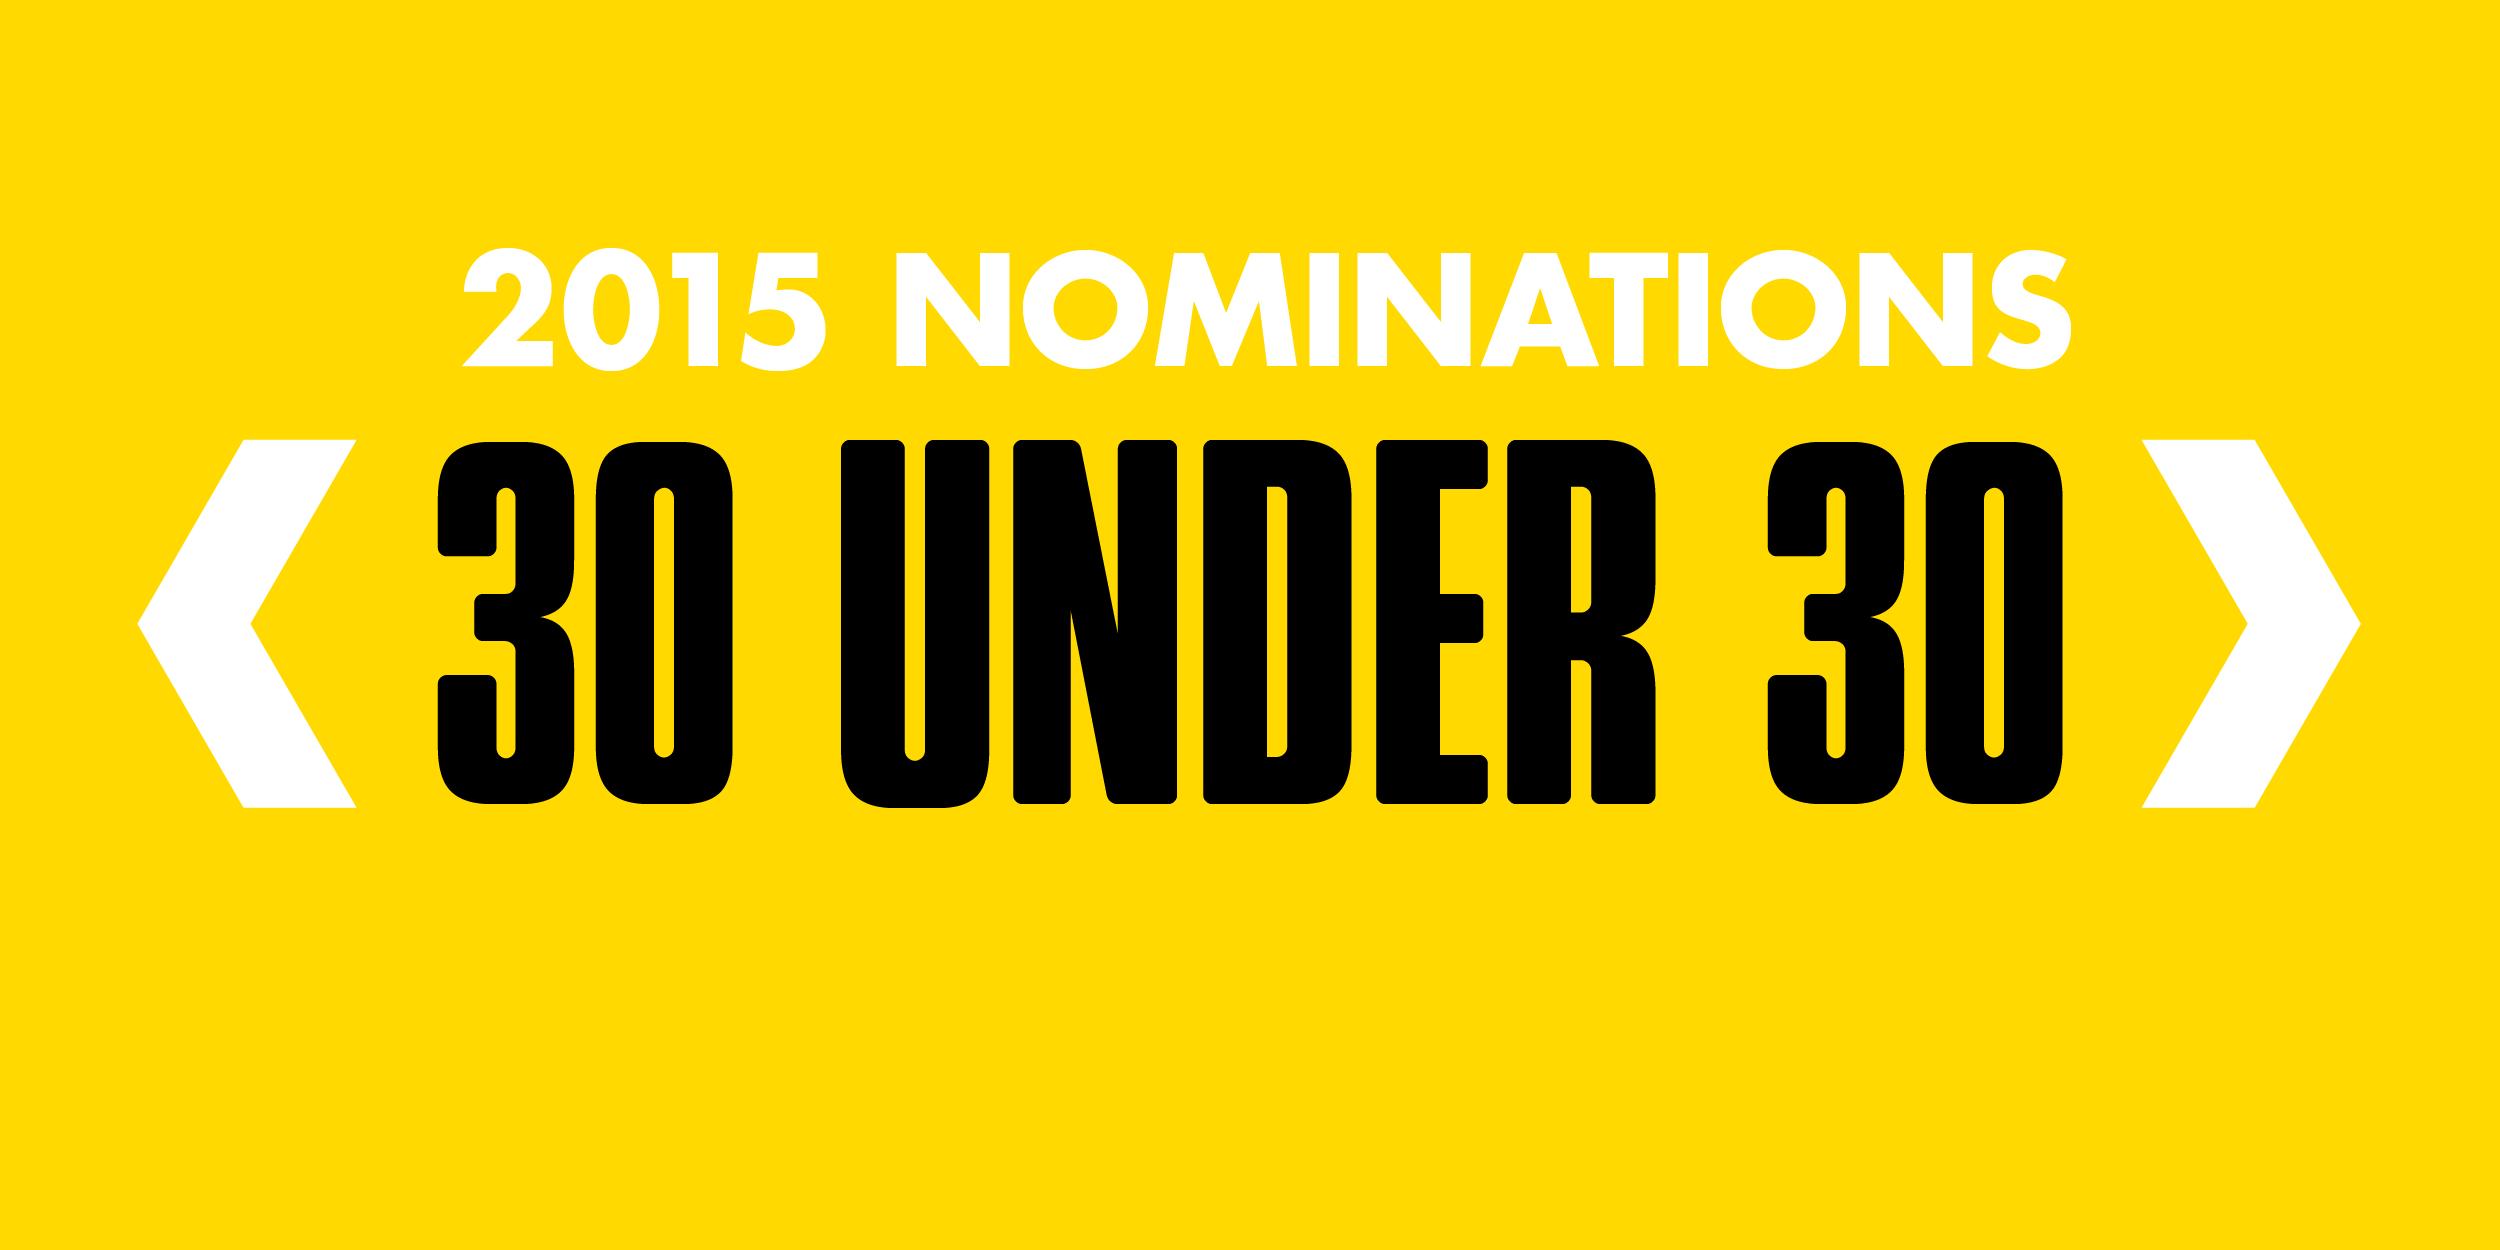 Marketing magazine 30 under 30 2015